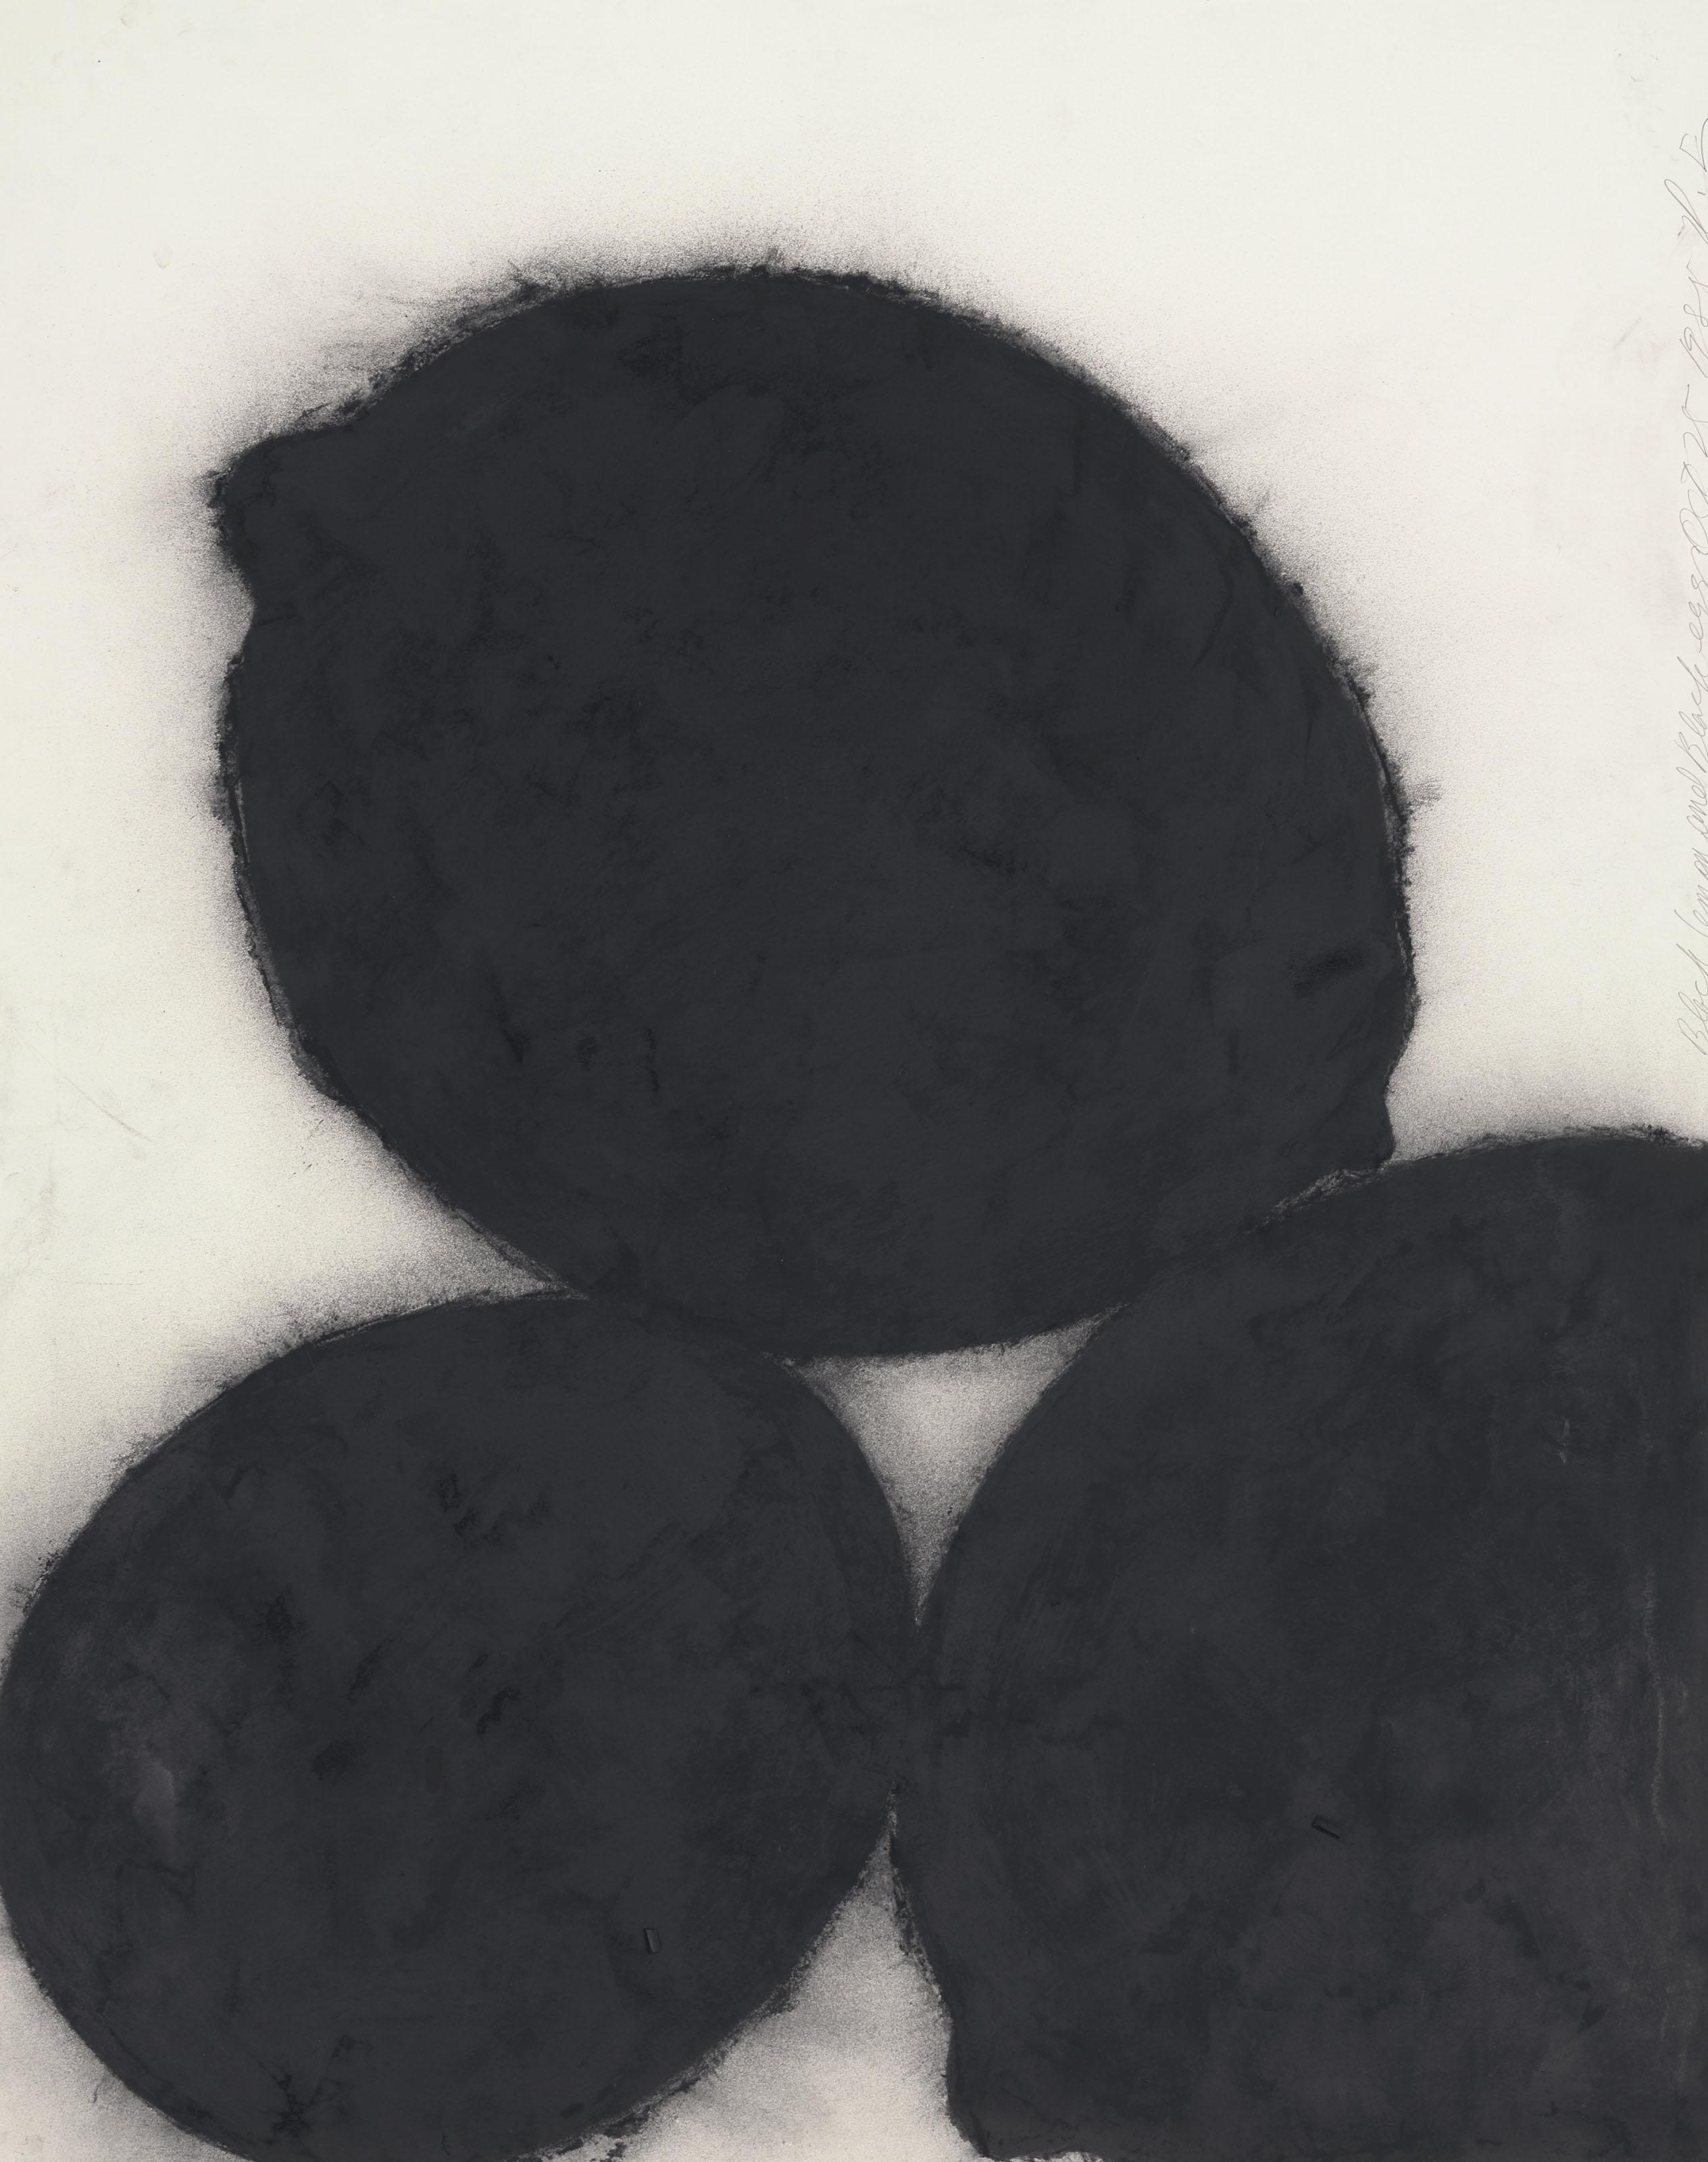 Black Lemons and Black Egg, October 25, 1985